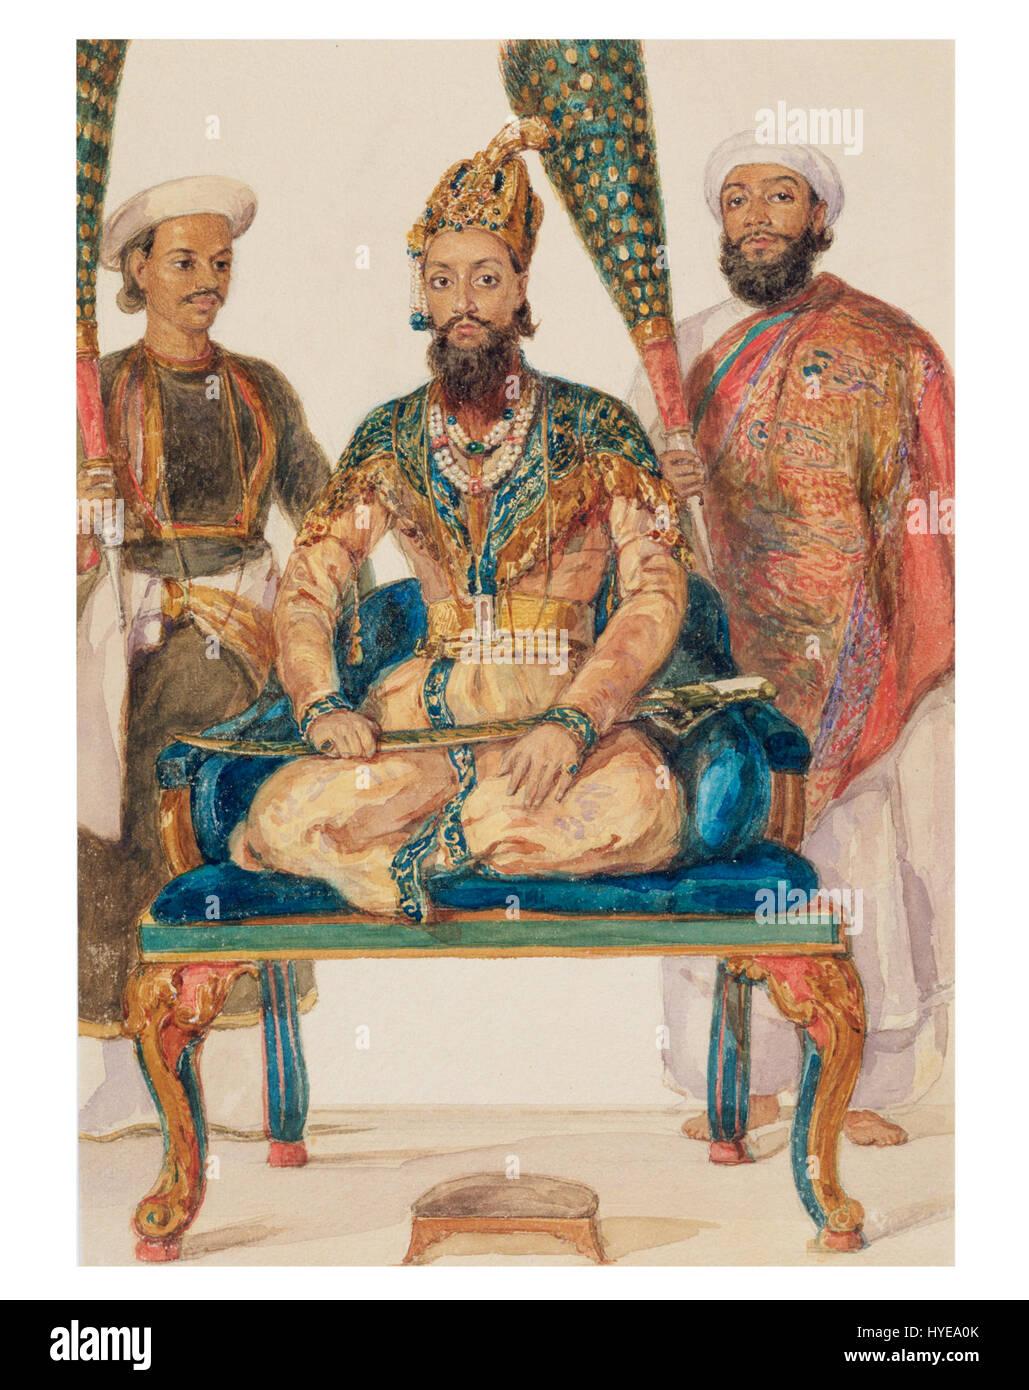 Prince Fakhr ud Din Mirza, eldest son of Bahadur Shah II, 1856 - Stock Image